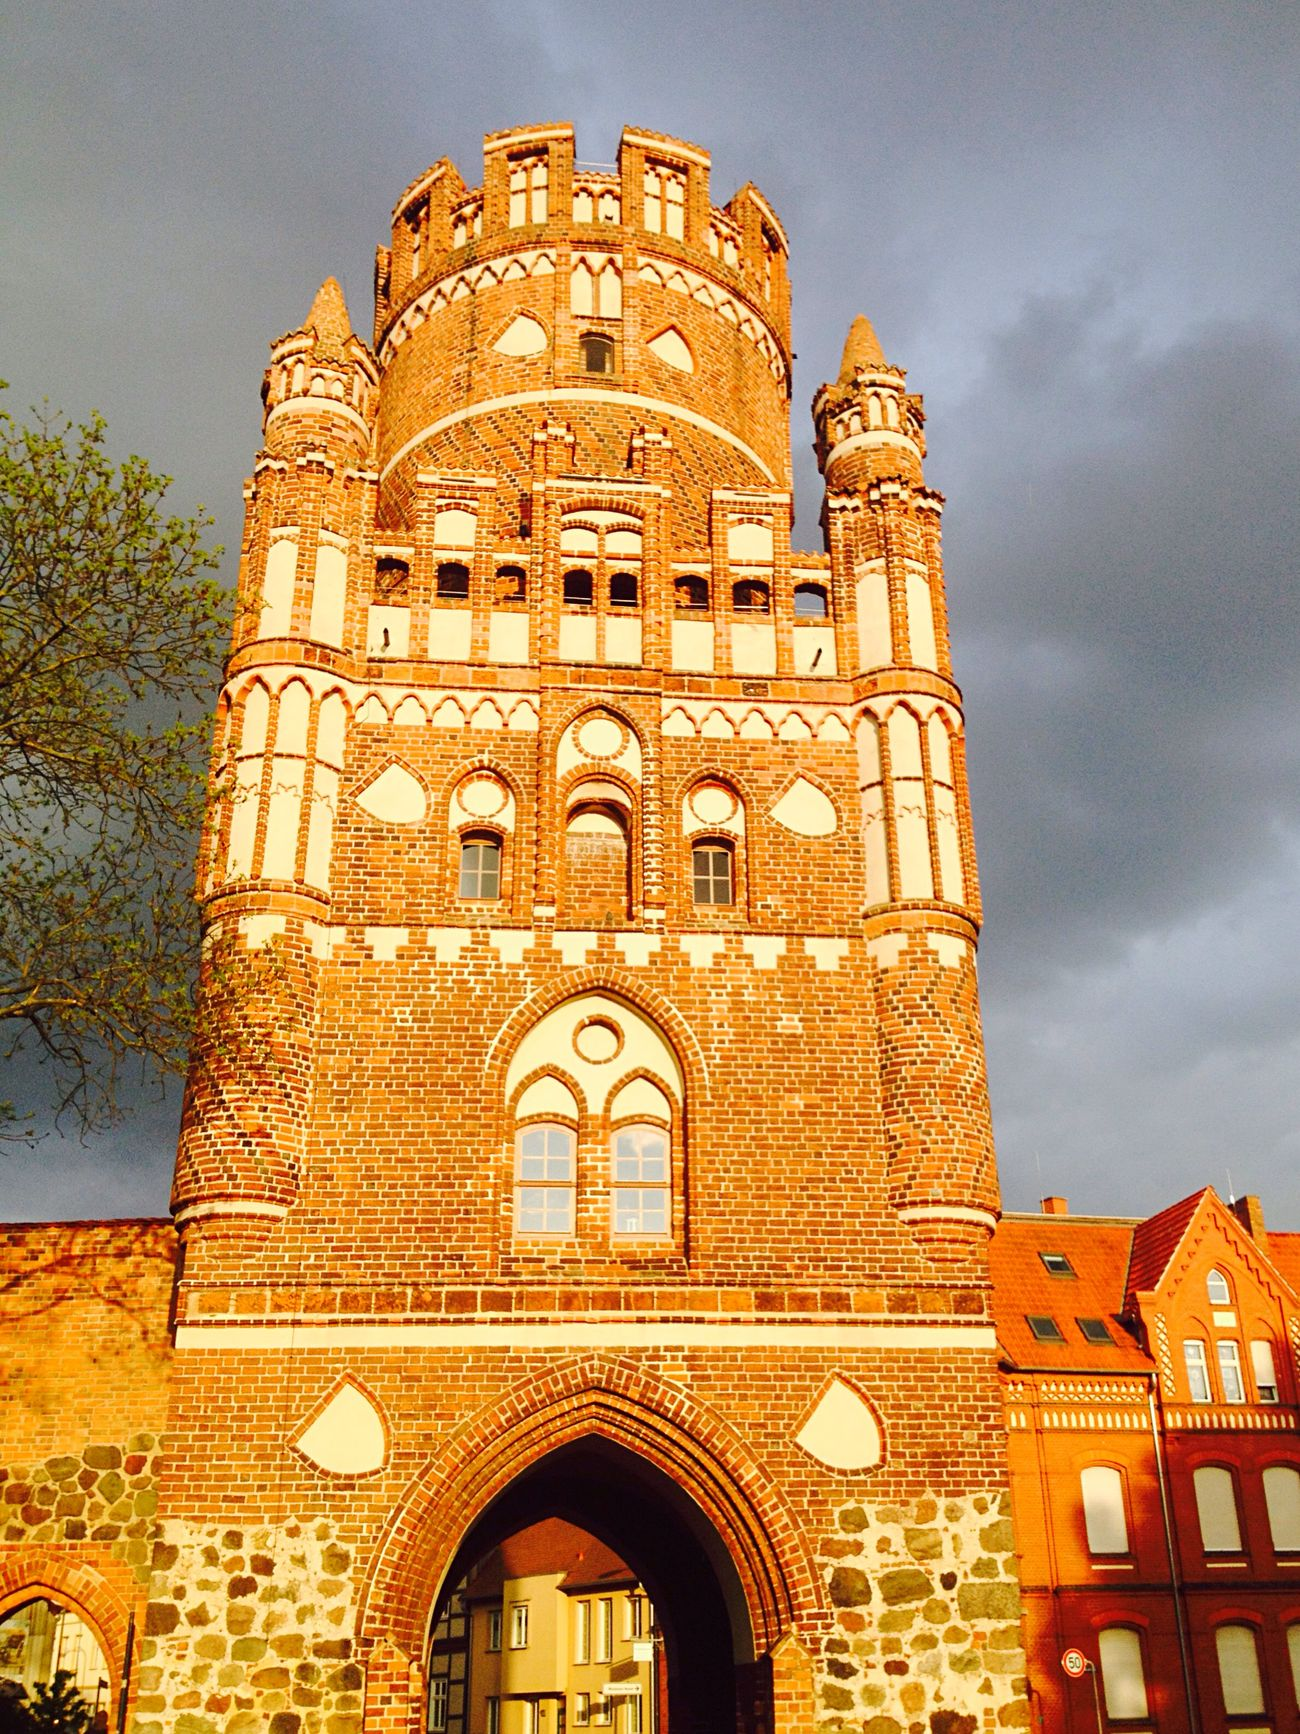 Hello World Uenglinger Tor in Stendal mit Heiko Heinkele Historical Building Old Buildings